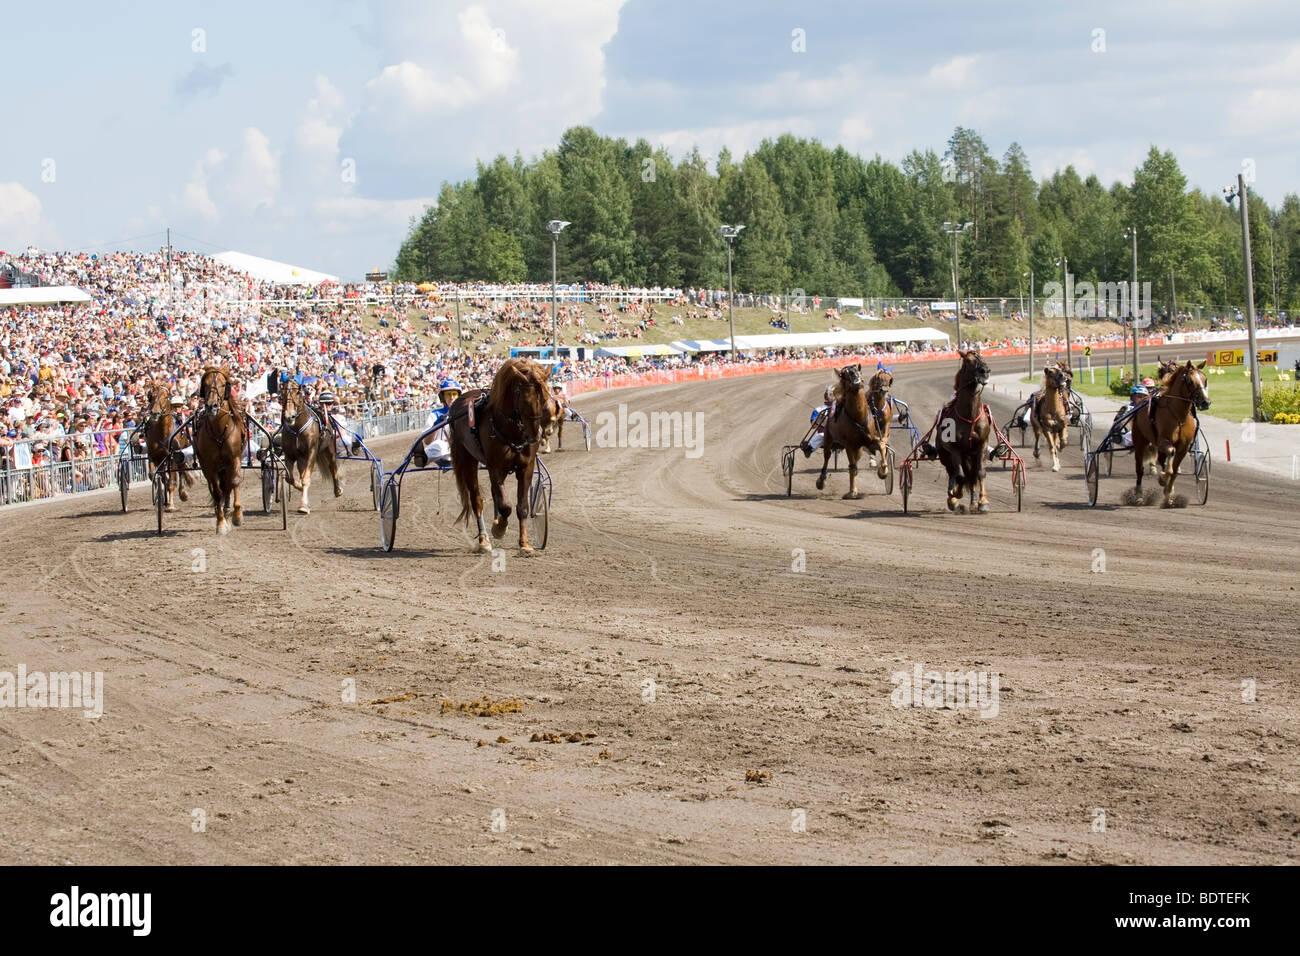 trotting race Lappeenranta Finland - Stock Image